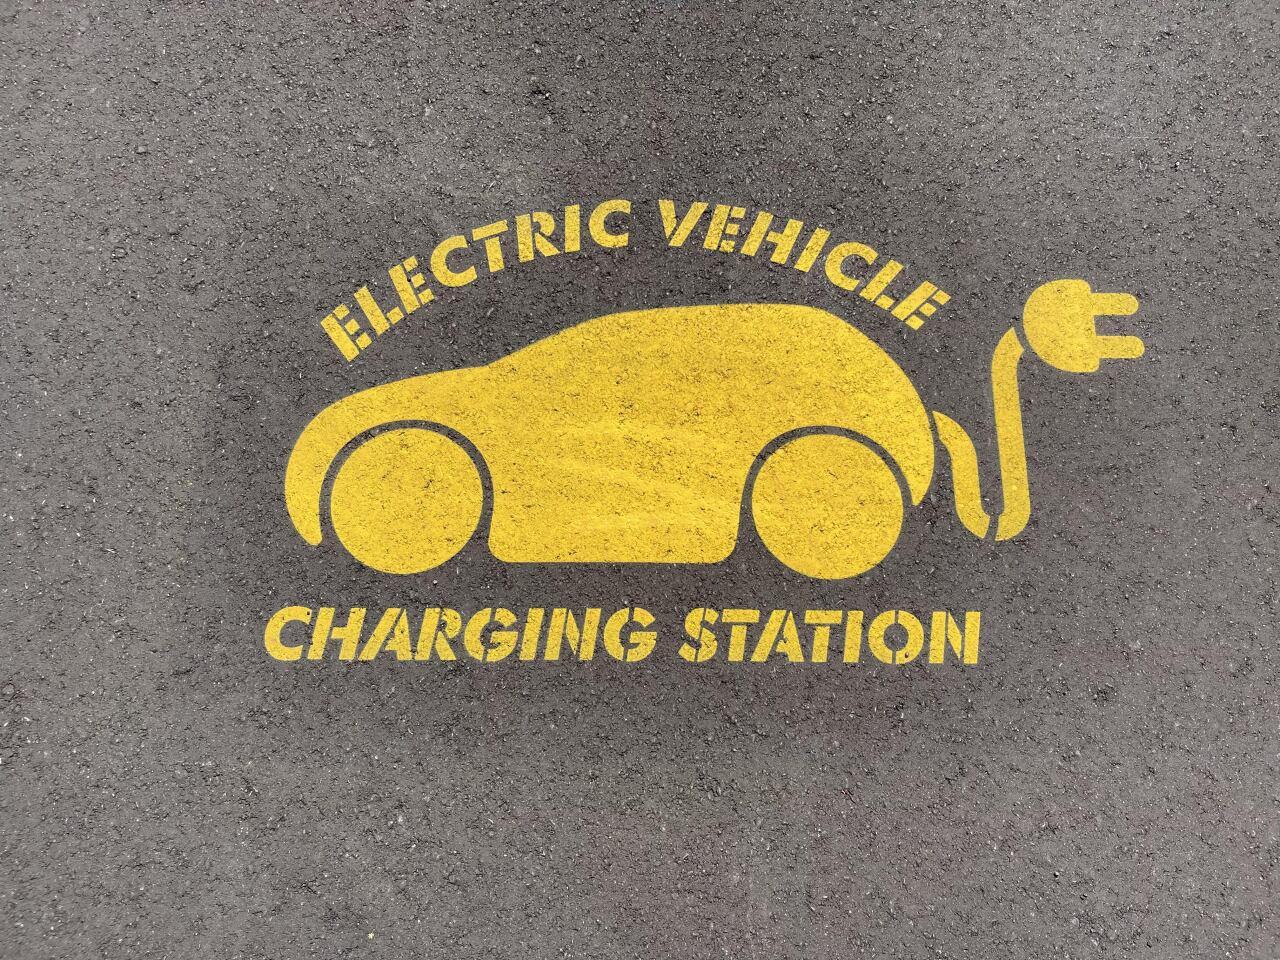 Electric vehicle charging station.jpeg